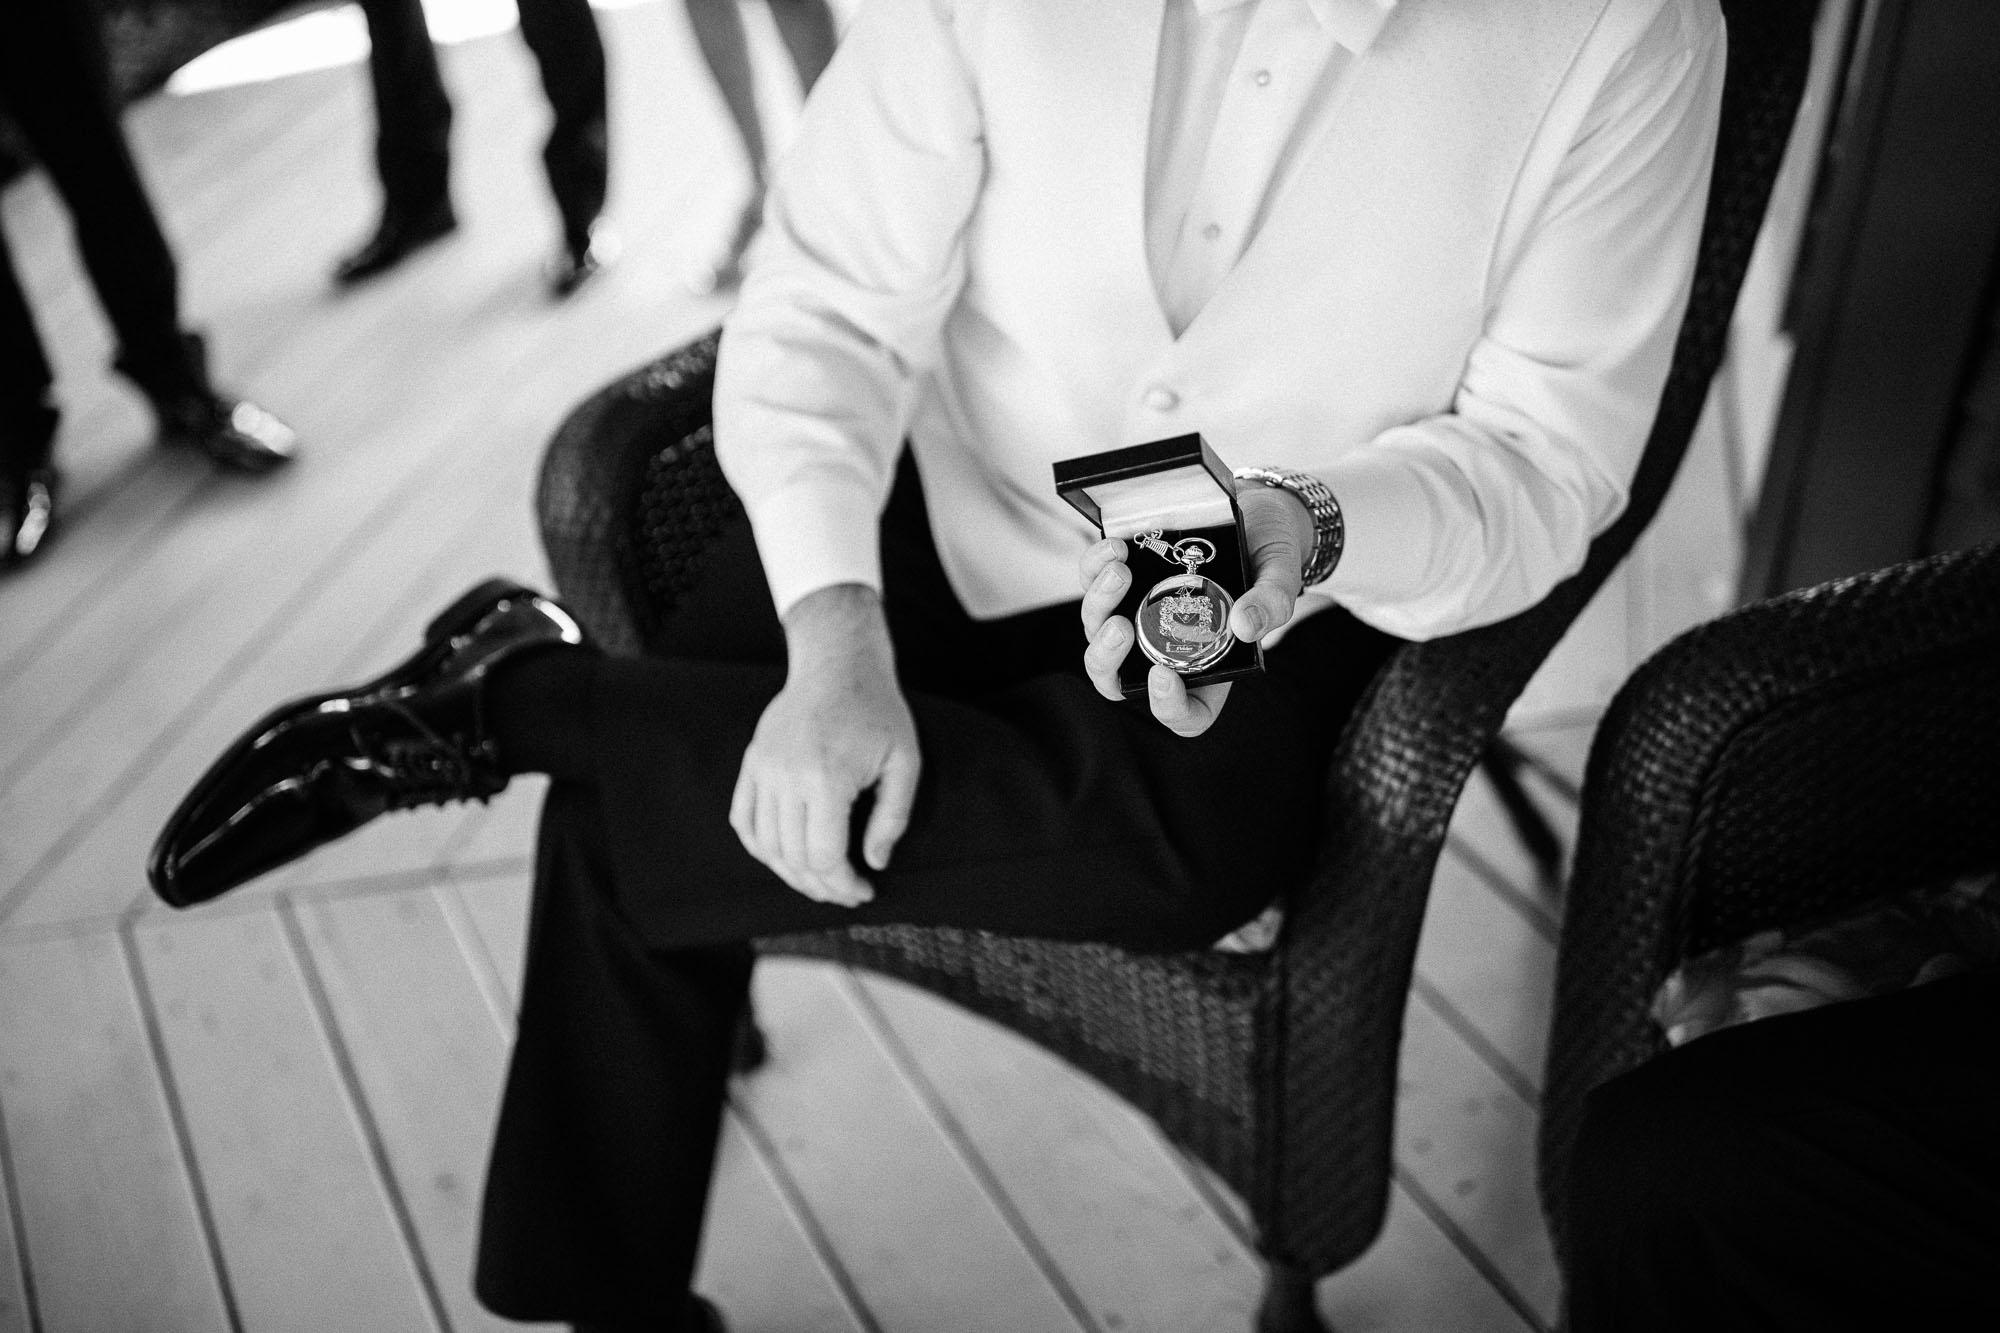 isle-of-que-wedding-6601.jpg